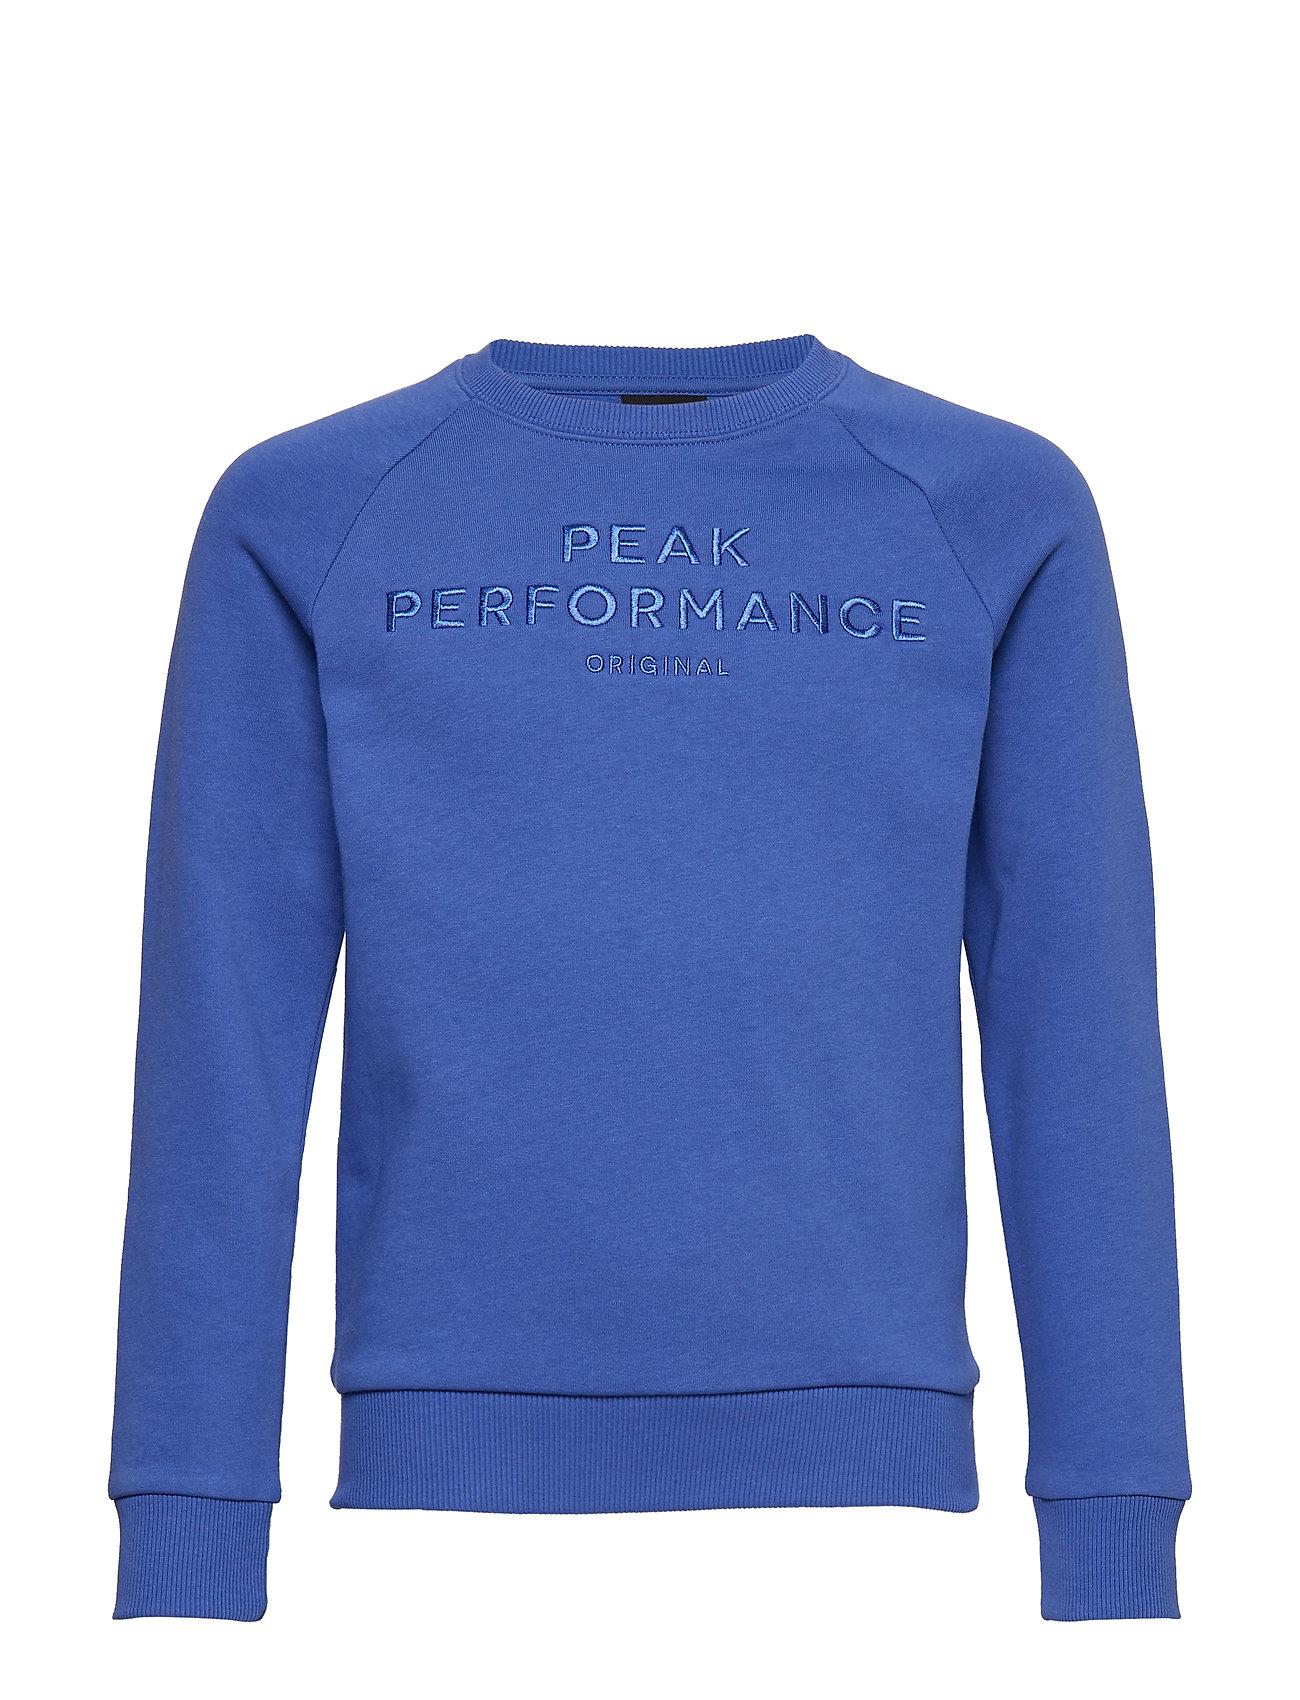 Peak Performance JR ORIGC - BAY BLUE